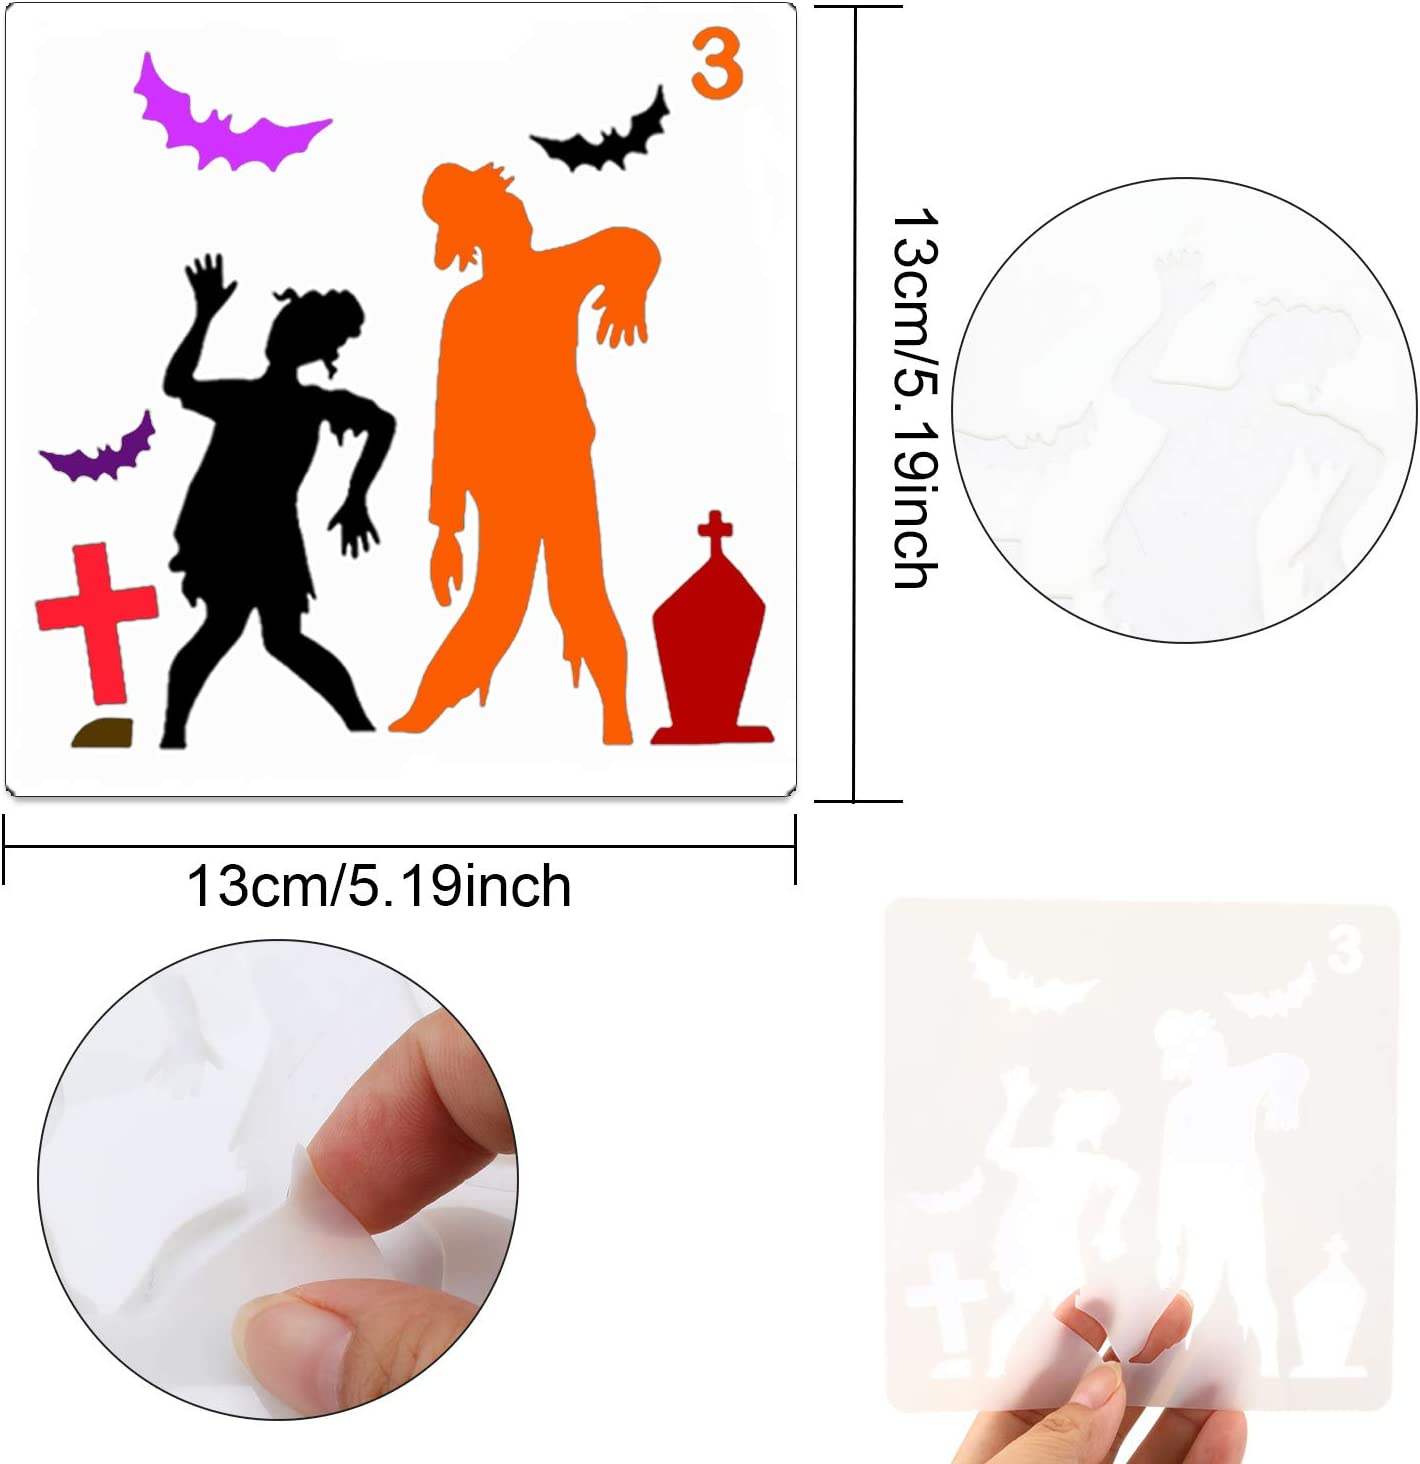 Painting Stencil for Adults Man Women Konsait Halloween Pumpkins Temporary Tattoos Stencils